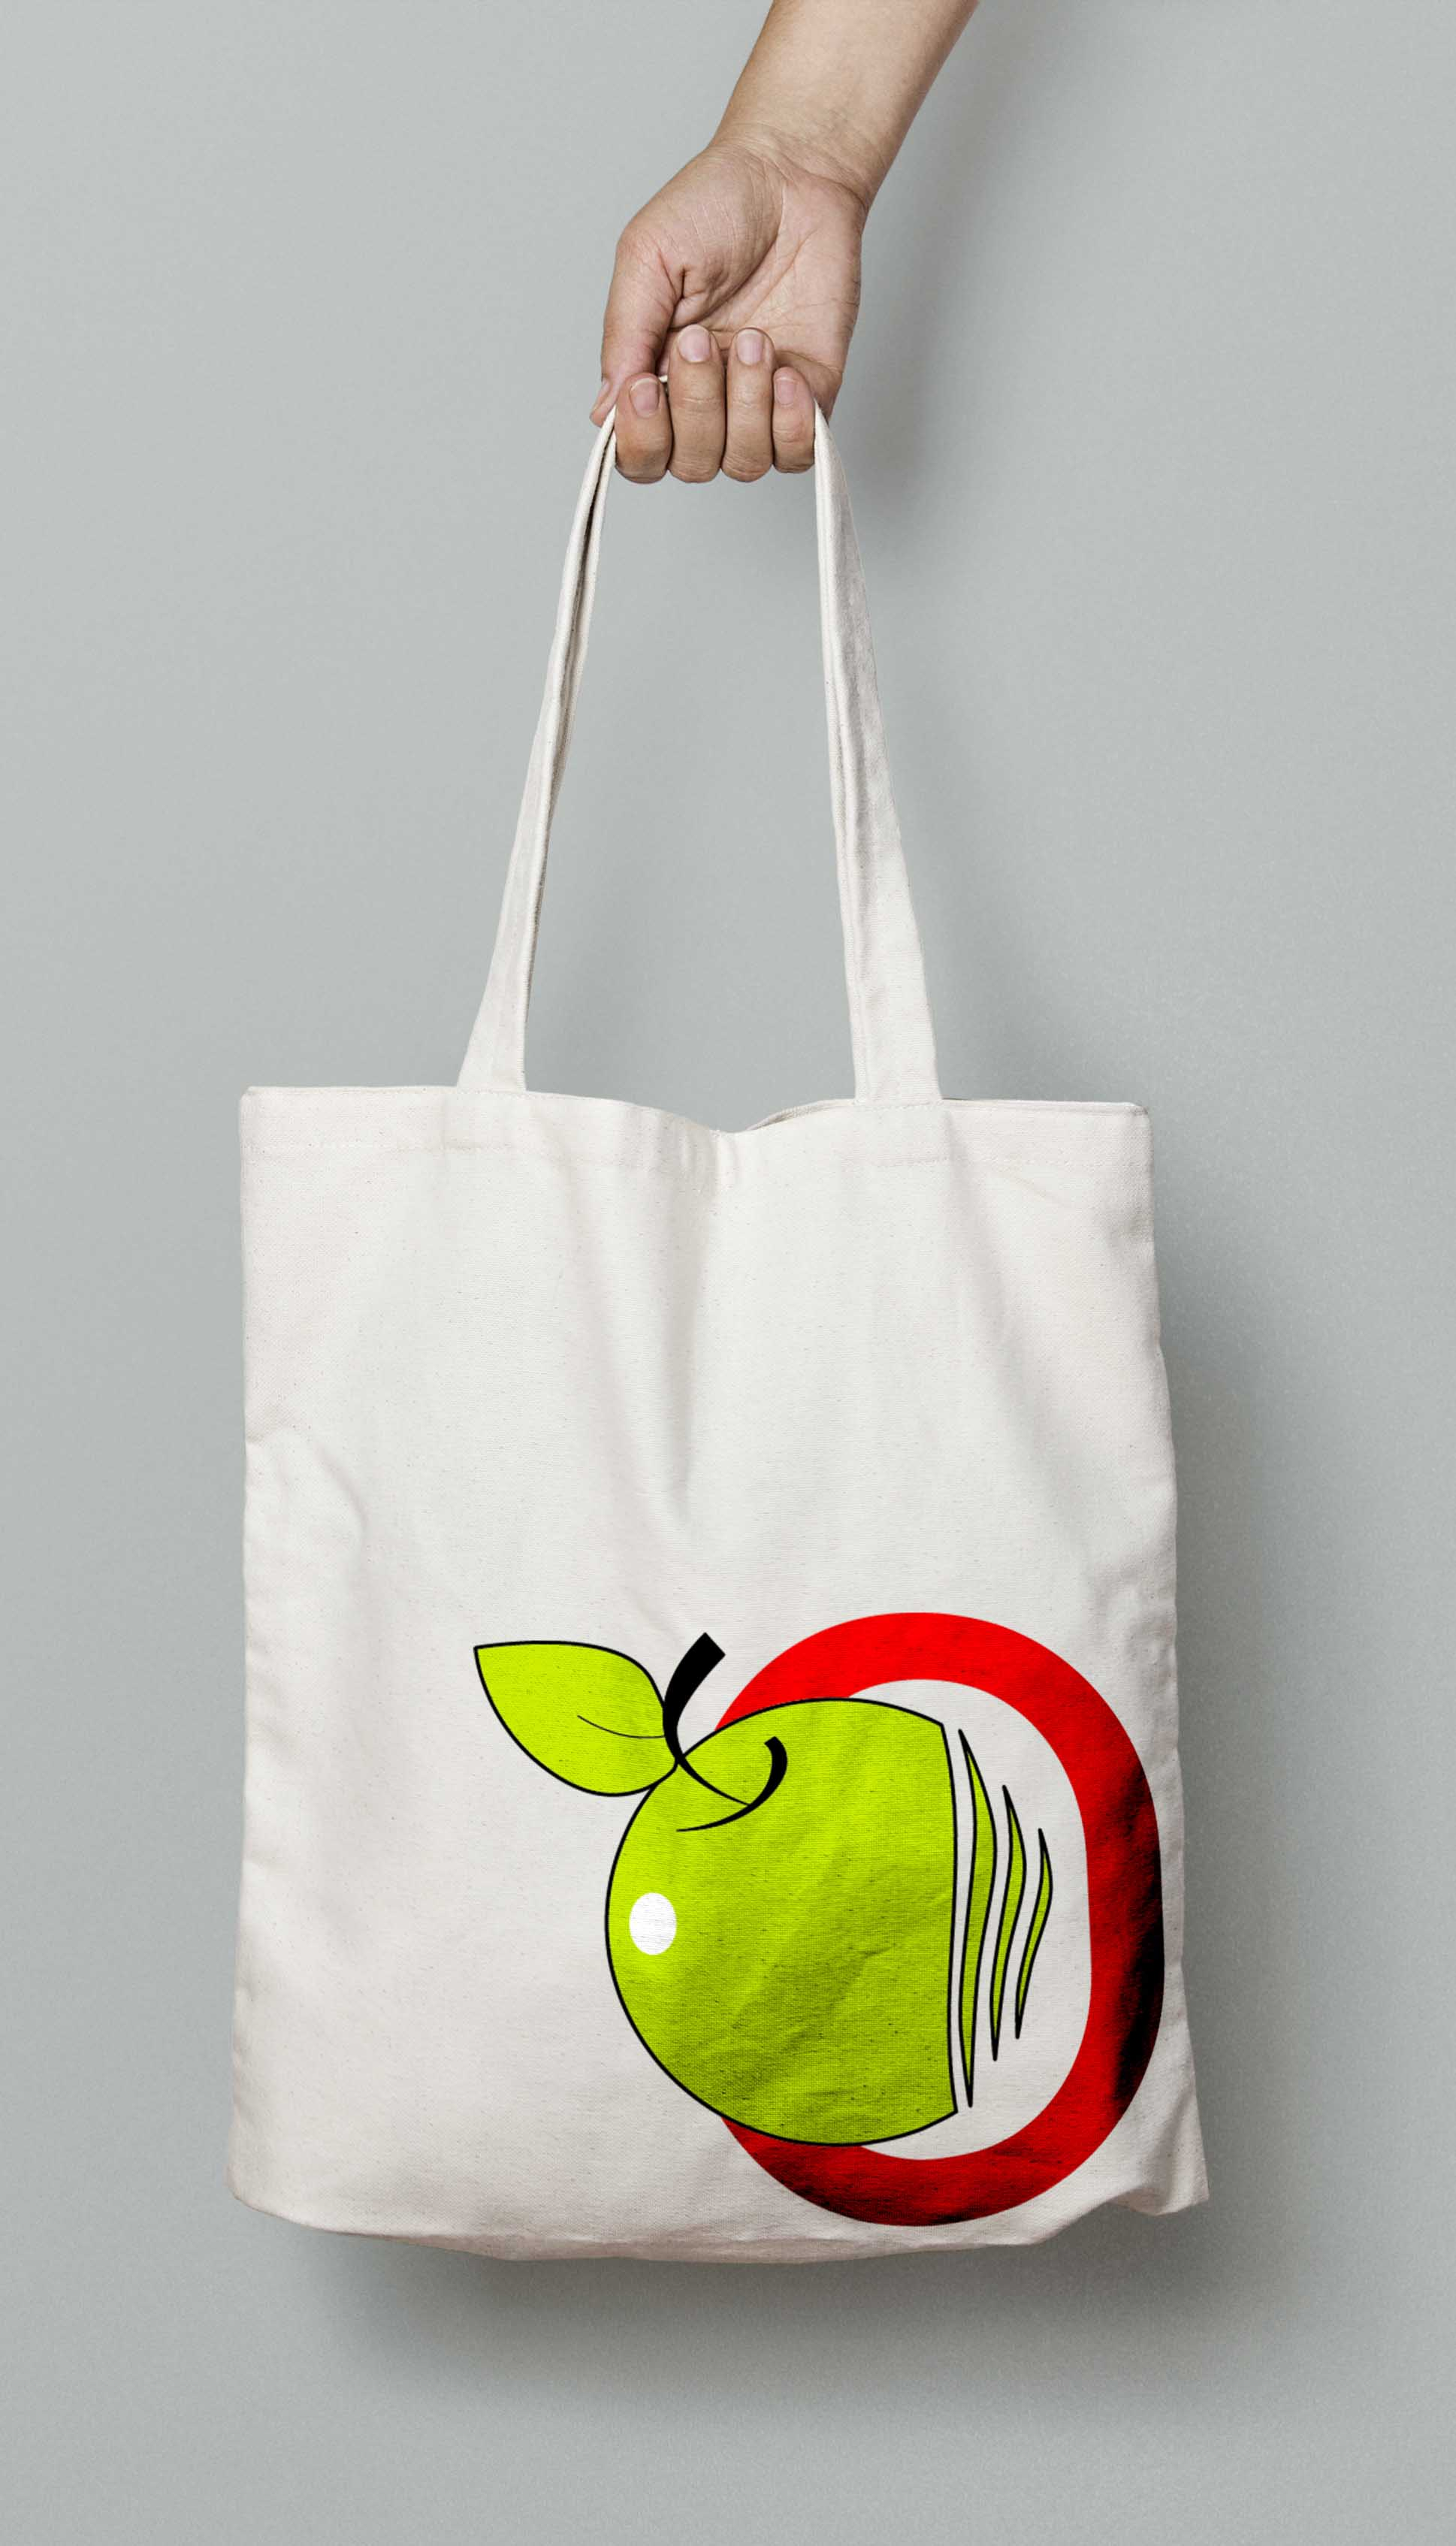 Логотип. Интернет - магазин по доставке продуктов питания. фото f_9765ad88ed73b716.jpg